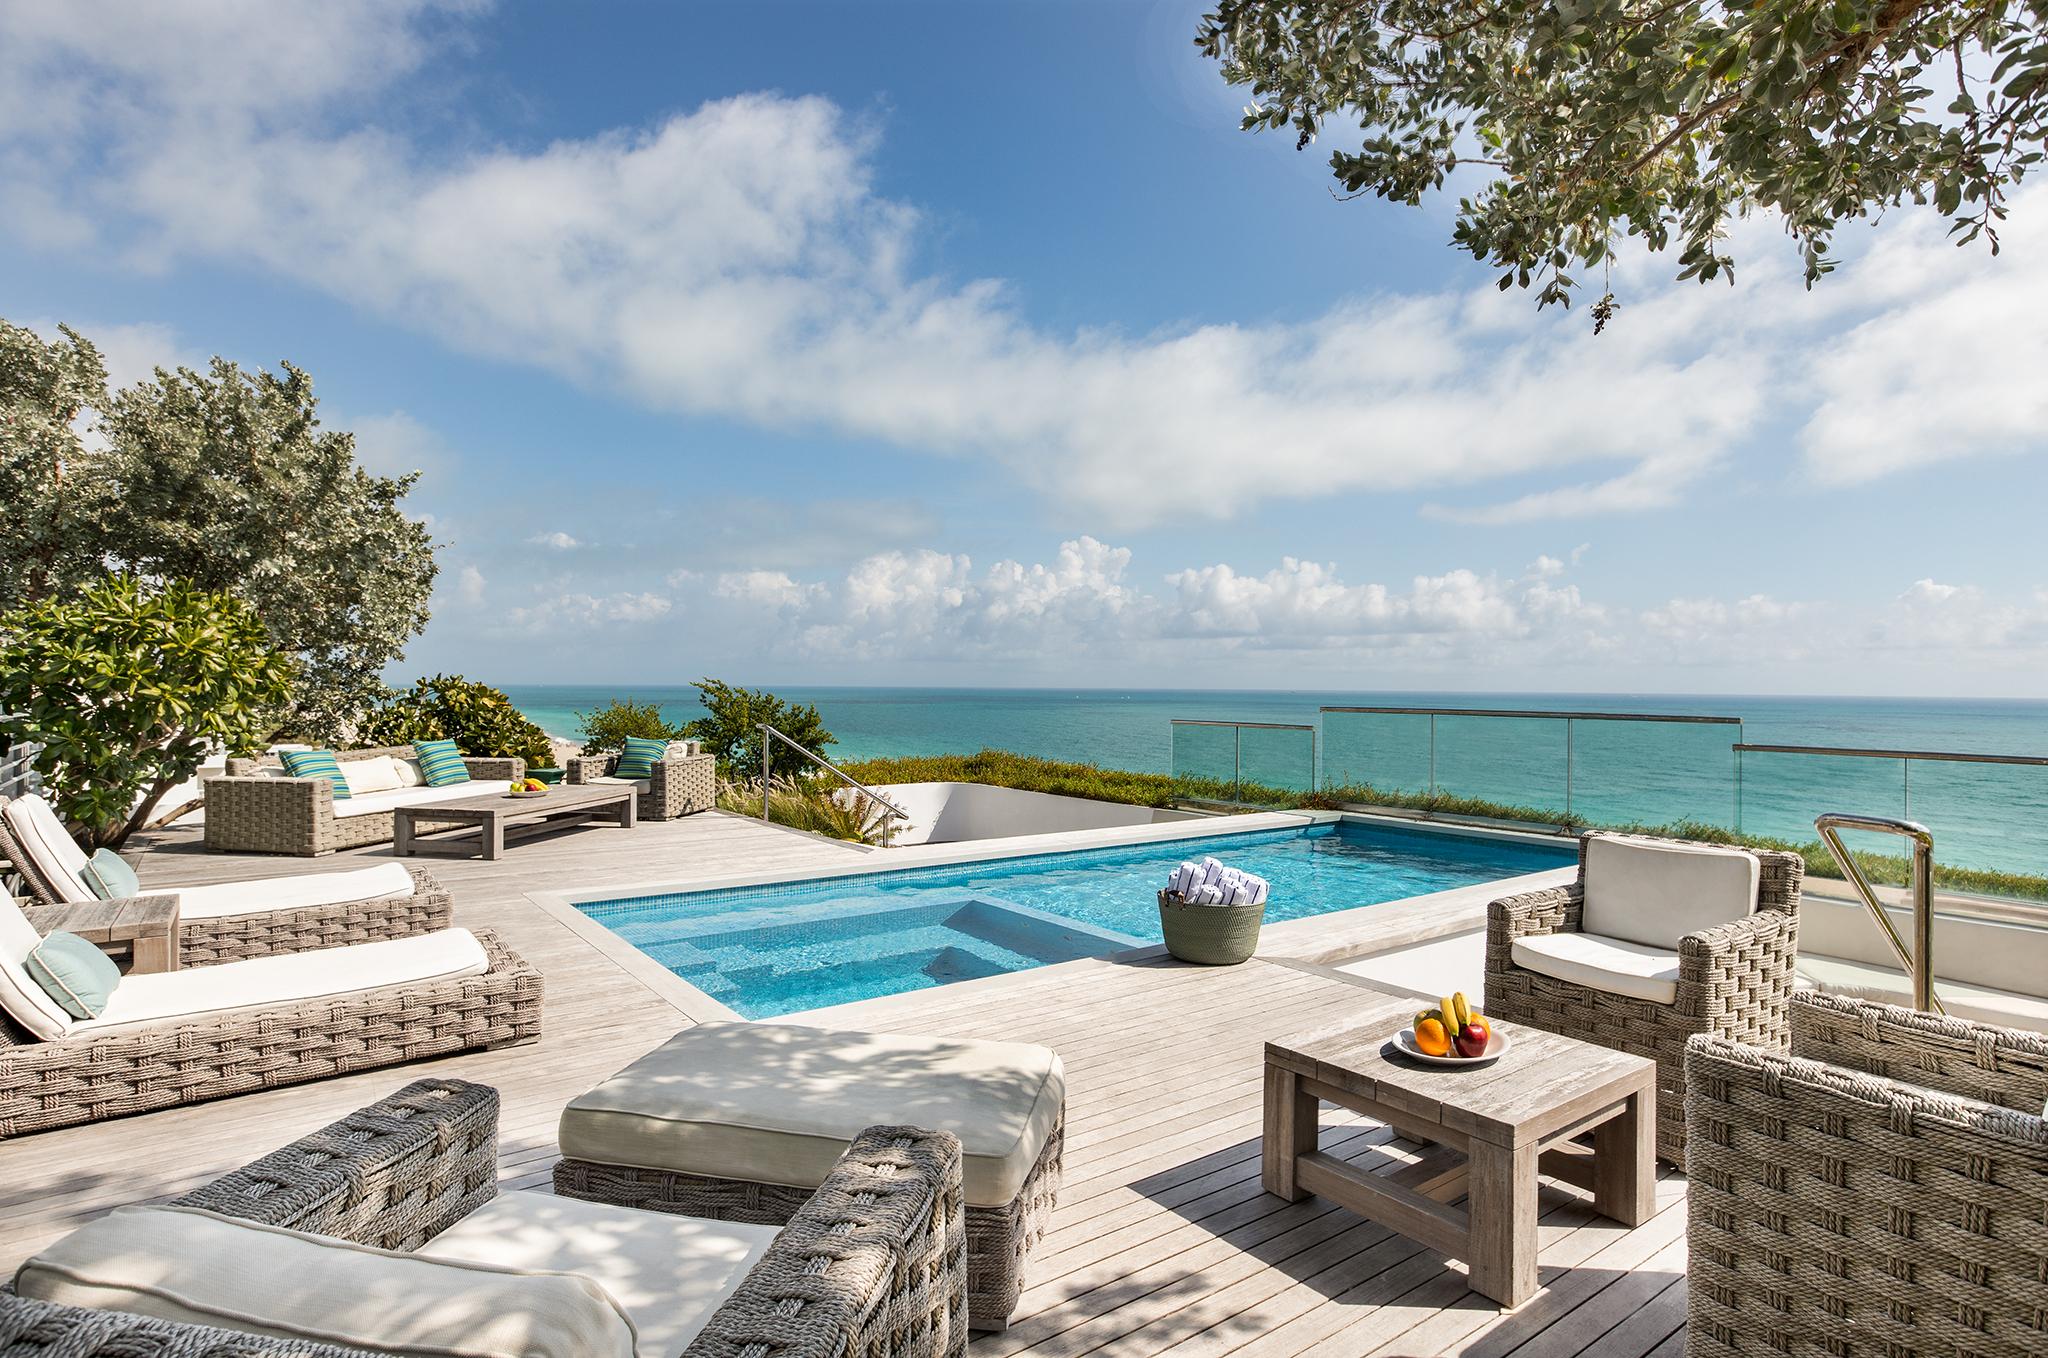 Hilton Bentley Miami South Beach Hotel Room 6